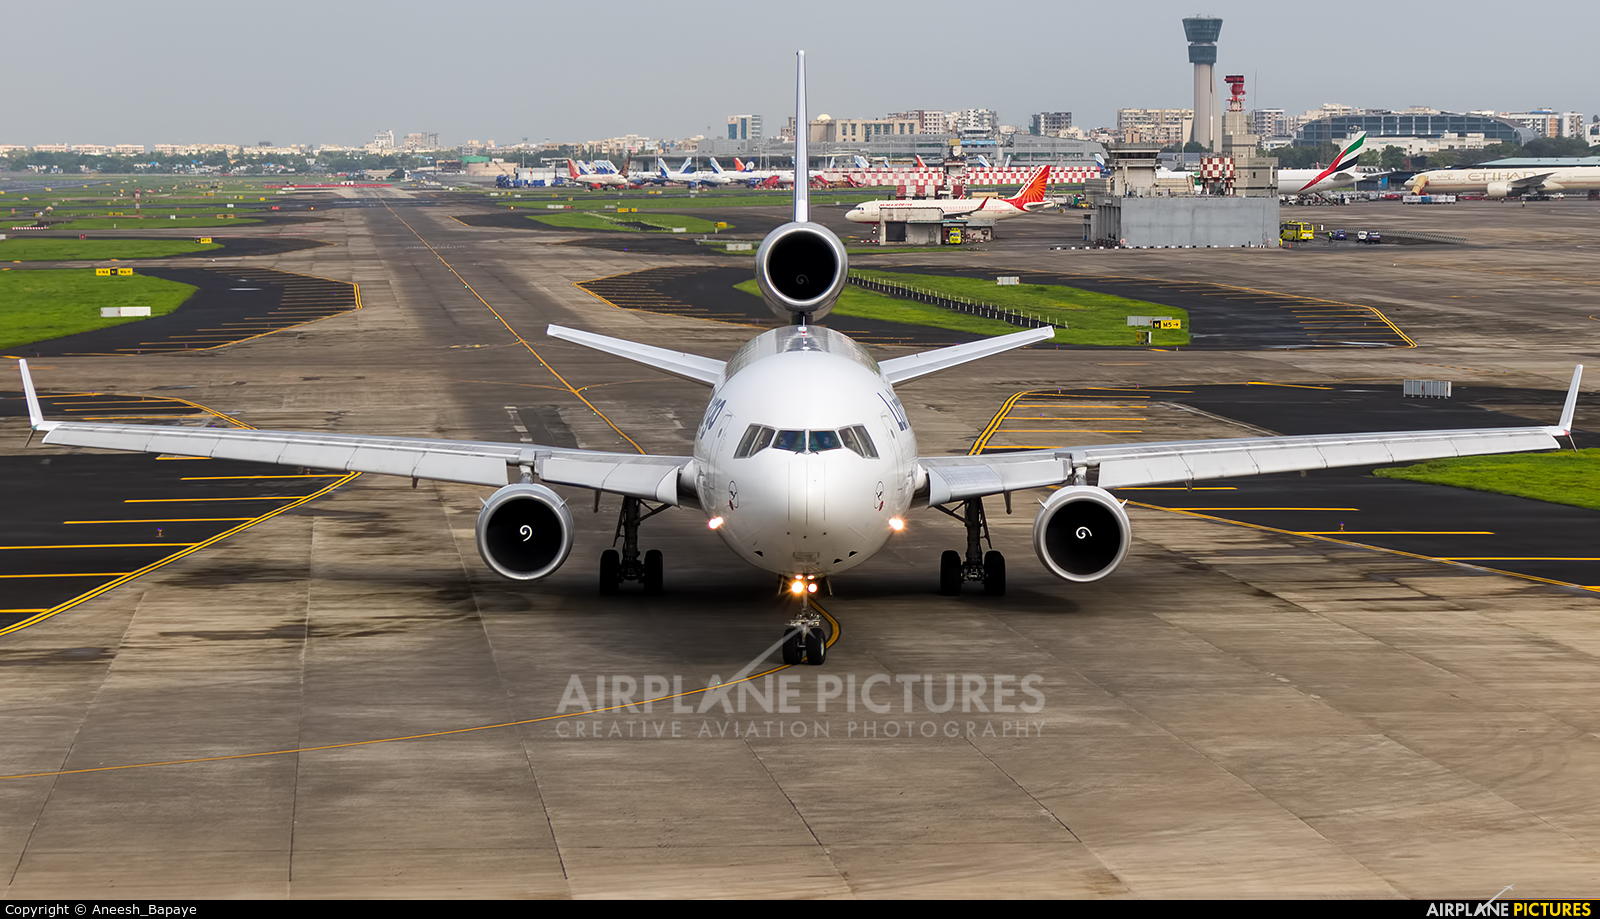 Lufthansa Cargo D-ALCD aircraft at Mumbai - Chhatrapati Shivaji Intl